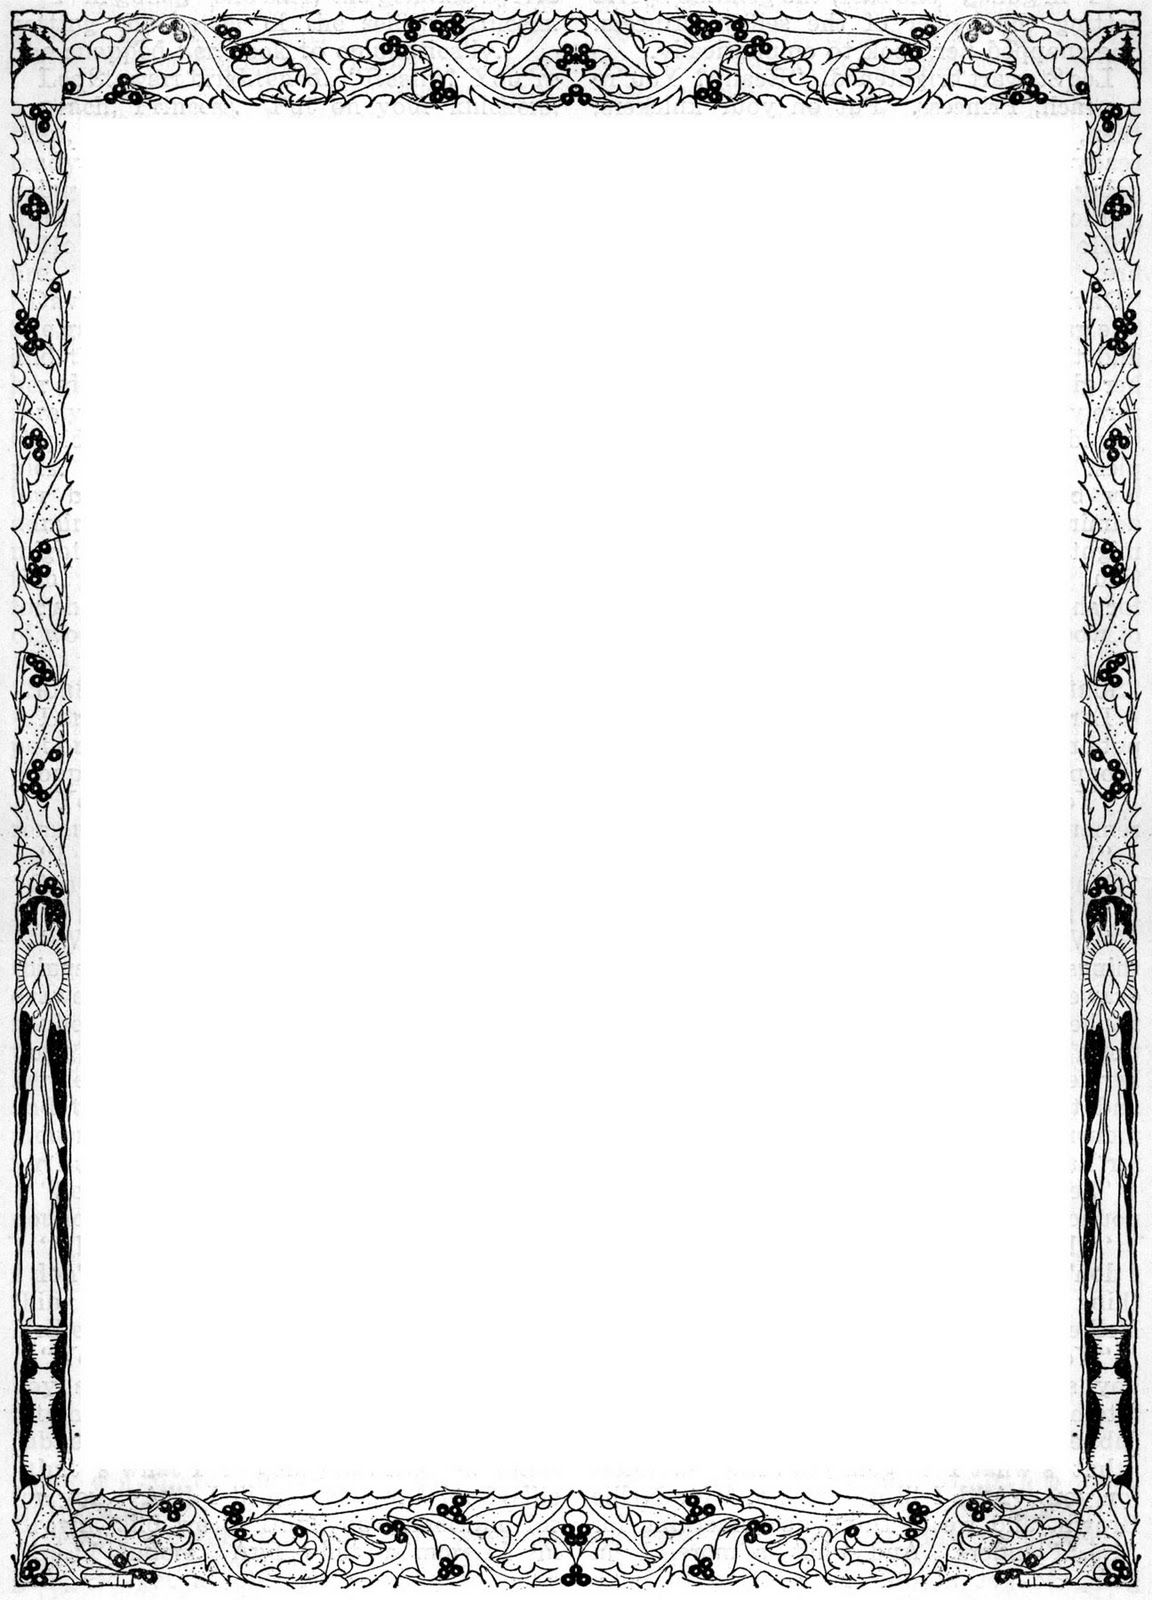 free decorative document borders.